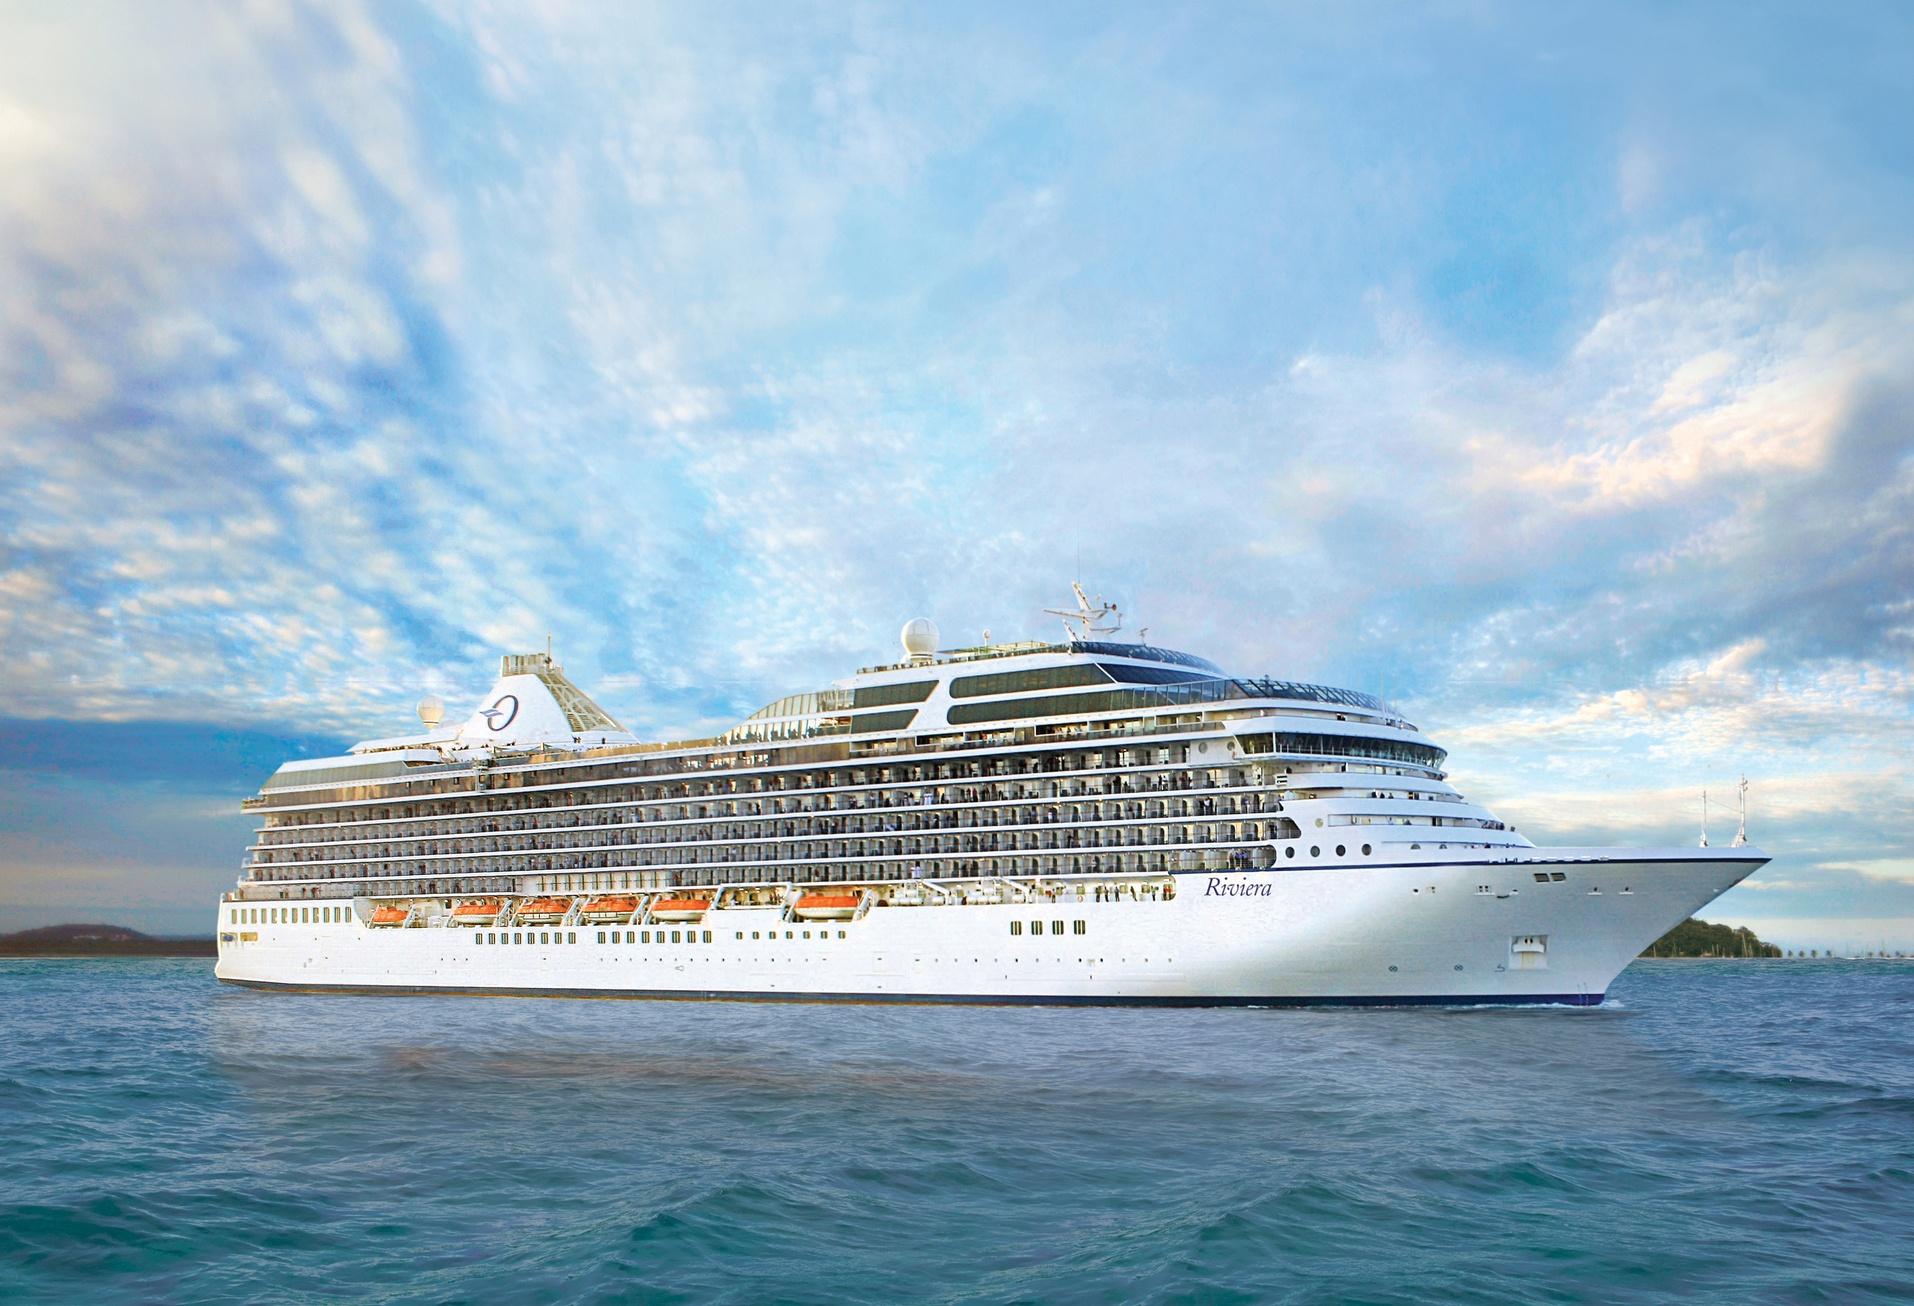 Cruise ship Riviera - Oceania Cruises